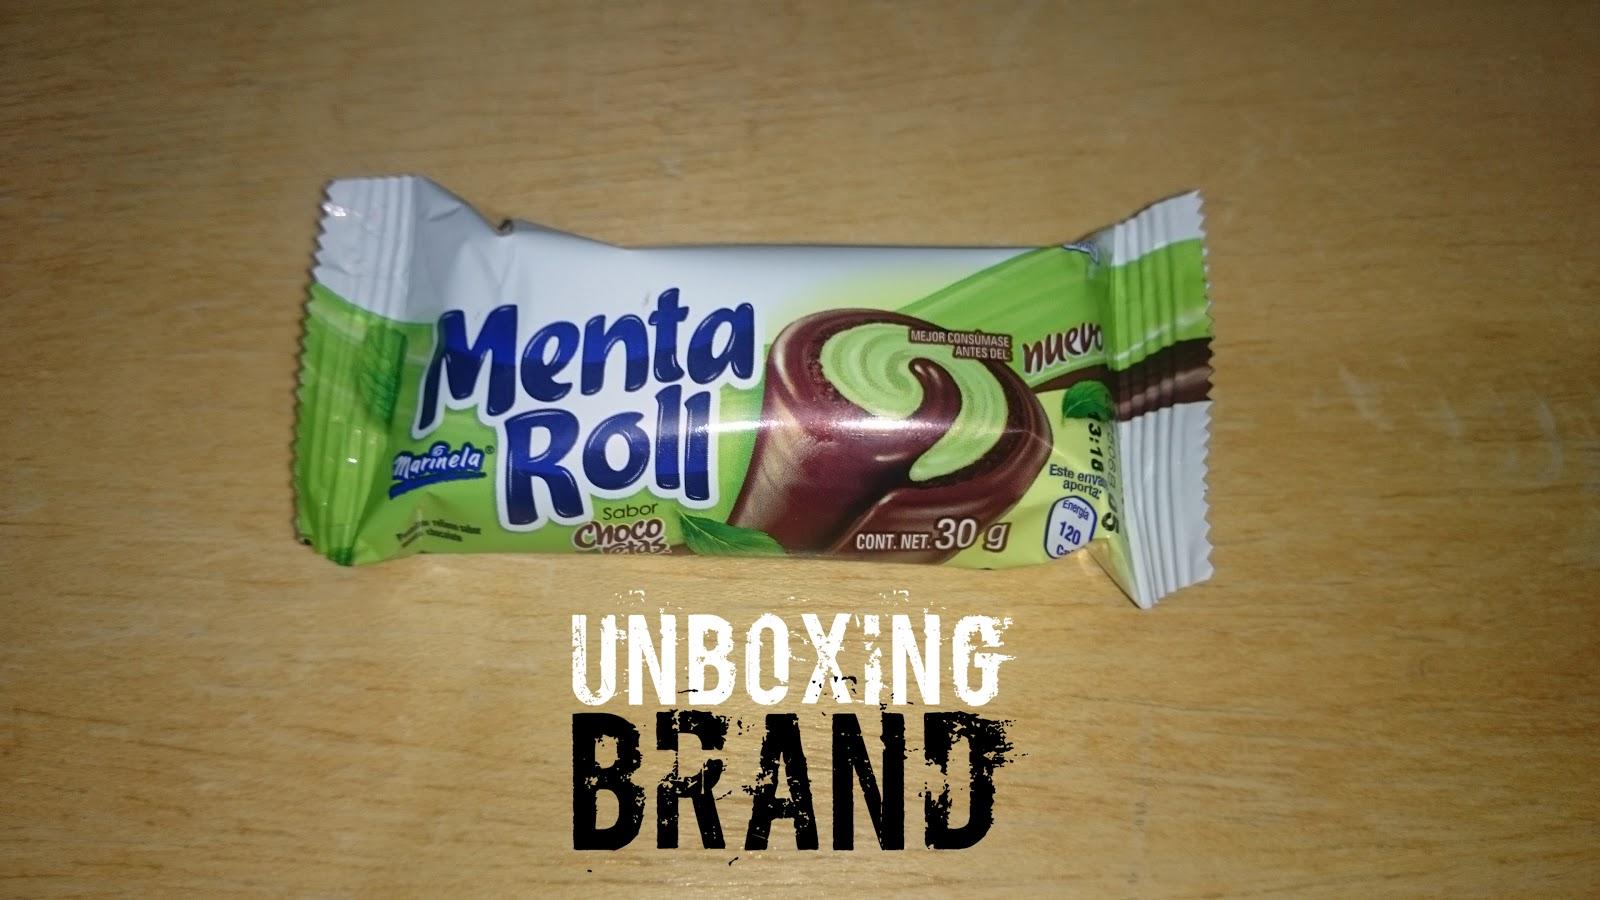 Unboxing Brand Unboxingsea Menta Roll Marinela